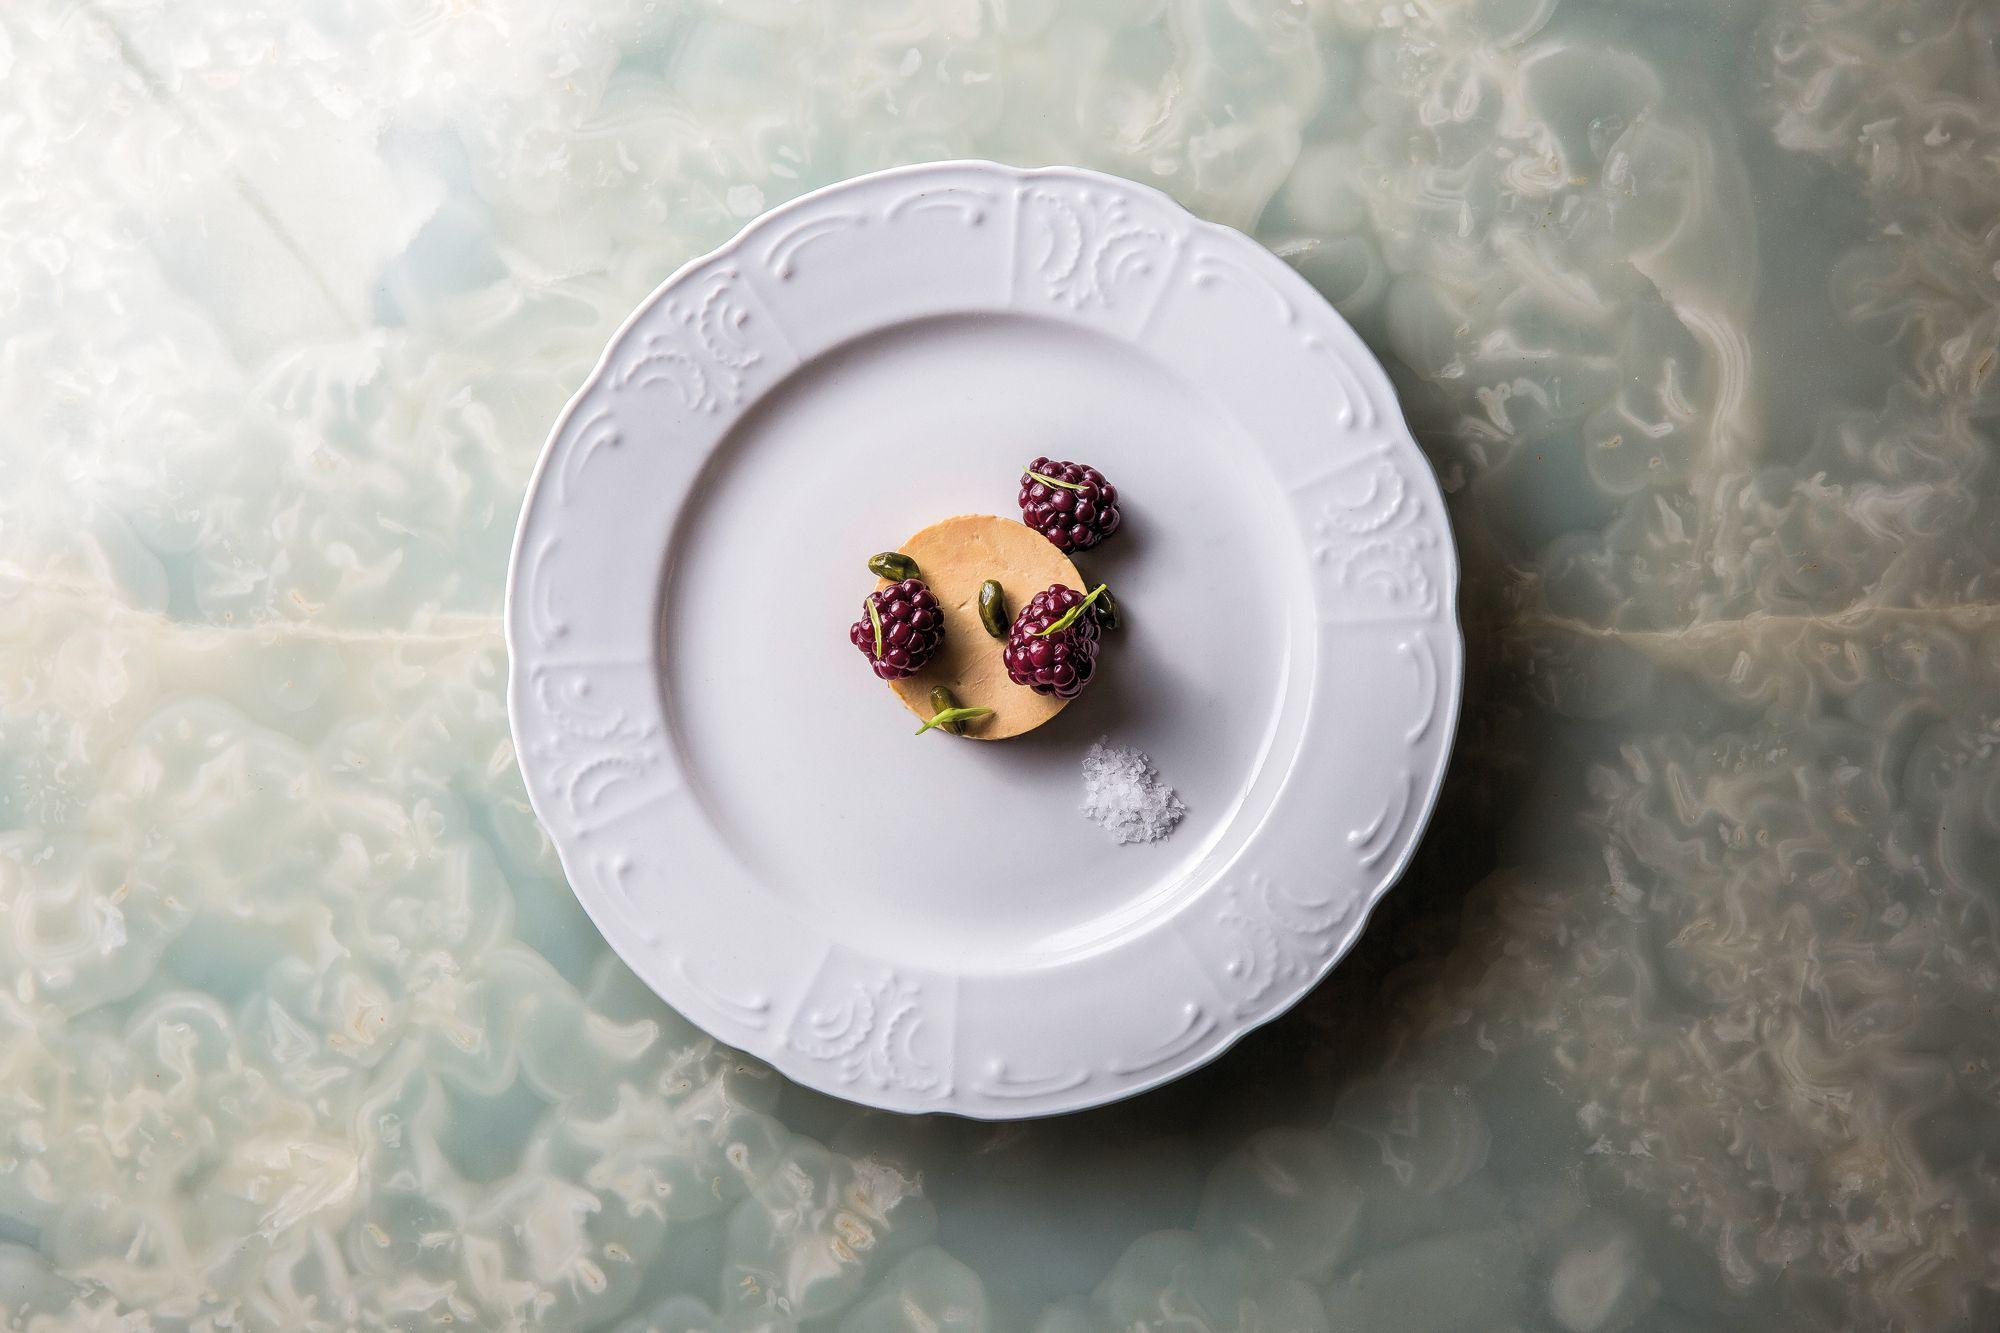 The Top 20 Restaurants In Hong Kong And Macau 2018/19